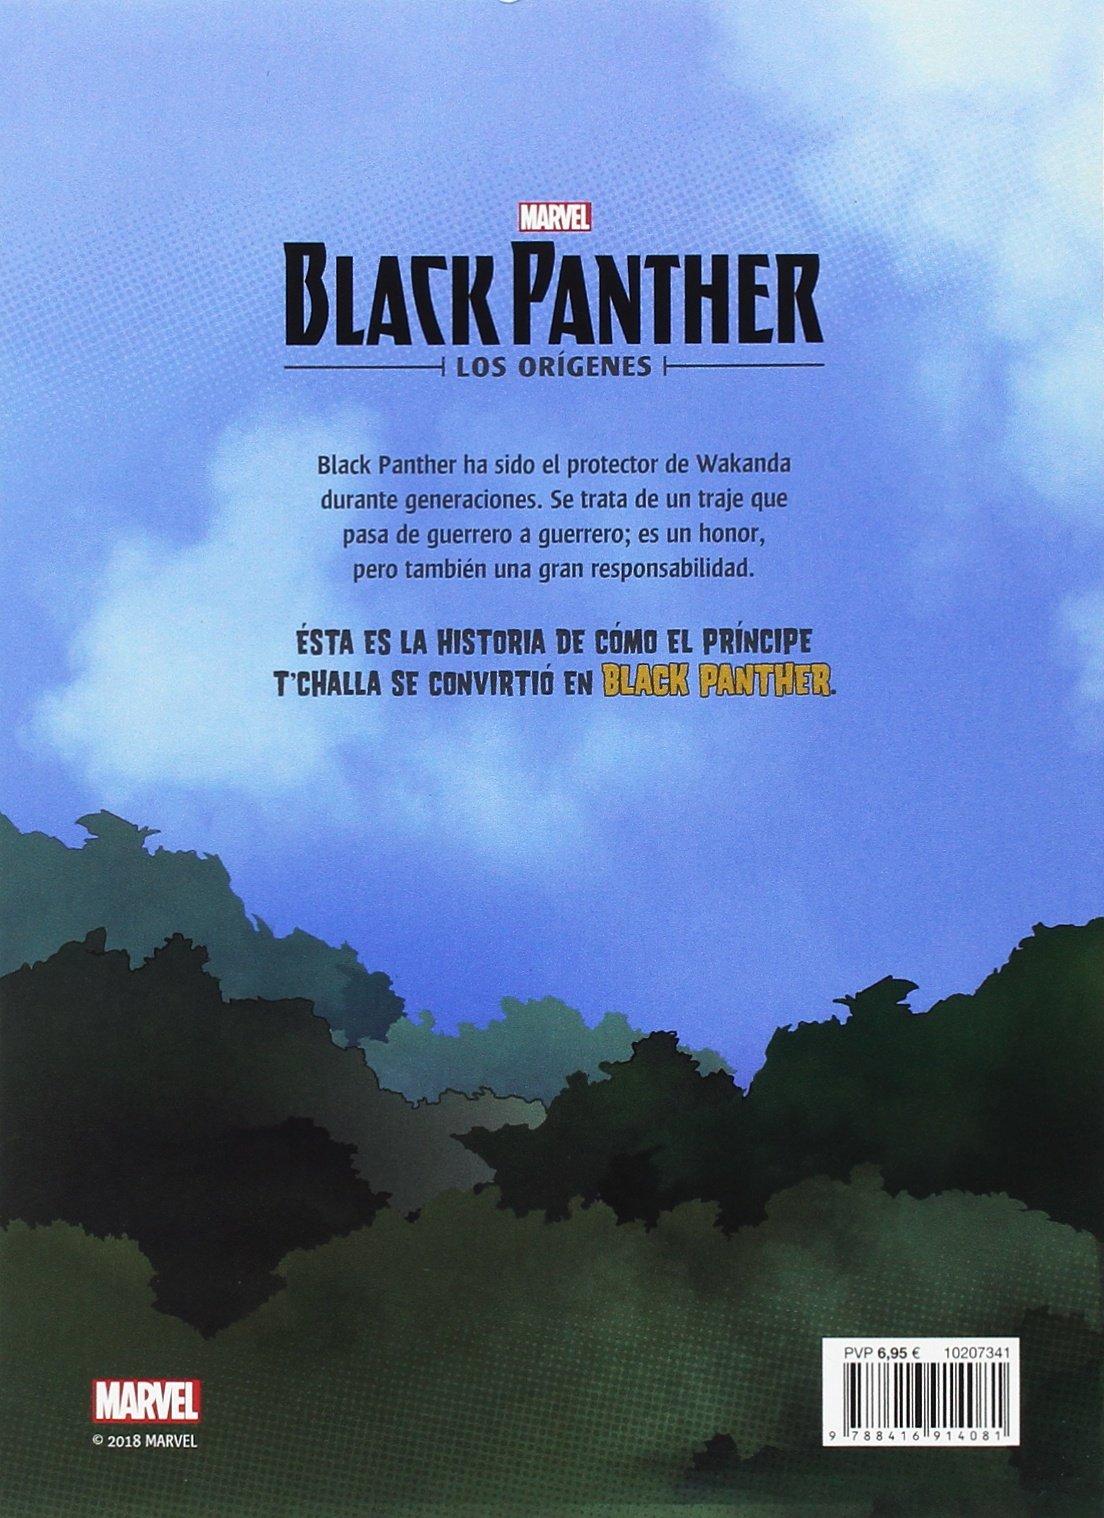 Black Panther. Los or�genes. La leyenda de Black Panther ...